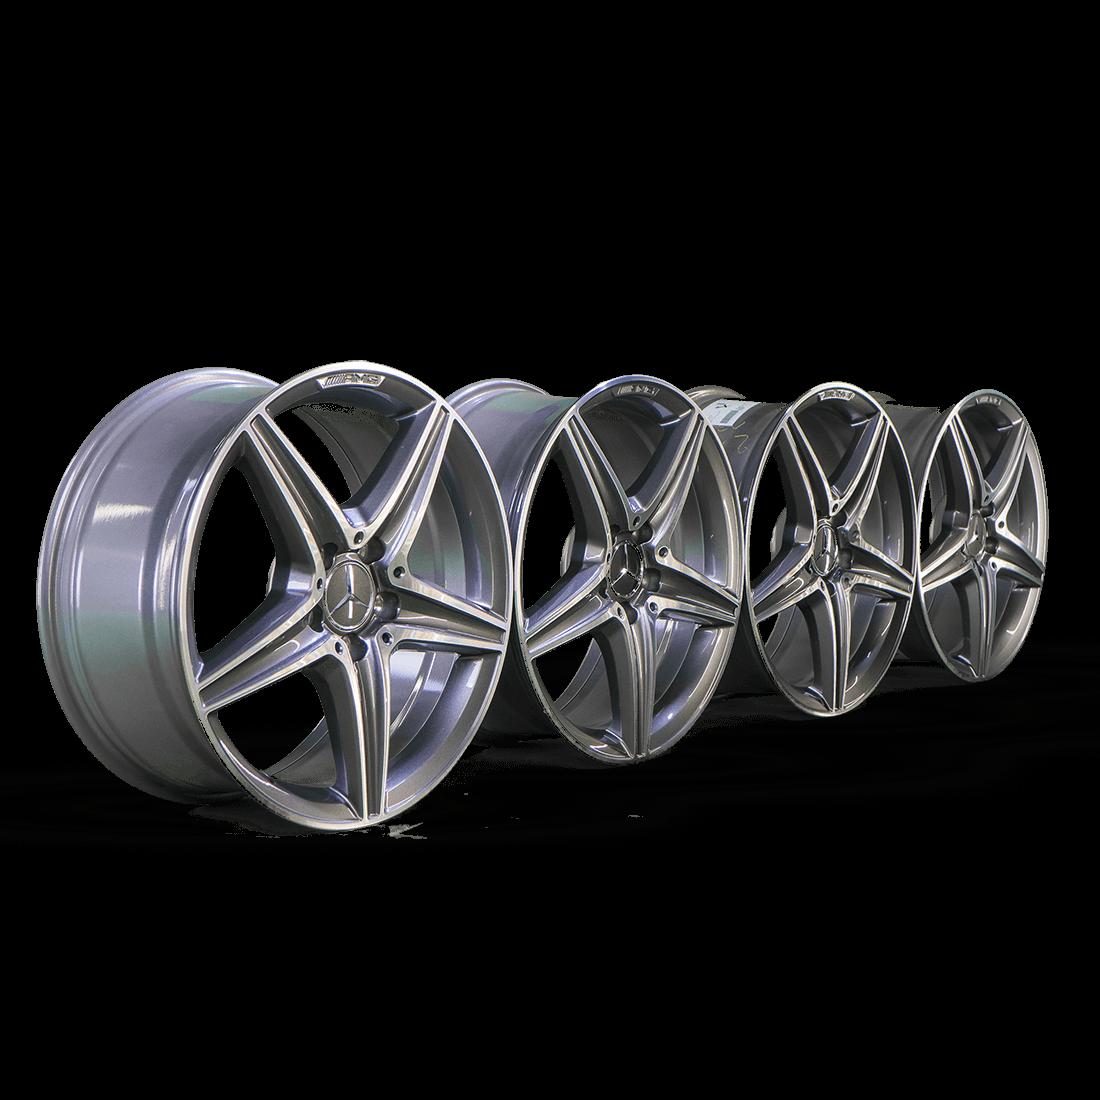 4x AMG 18 inch rims Mercedes E-class W213 convertible coupe W238 alloy rims  NEW